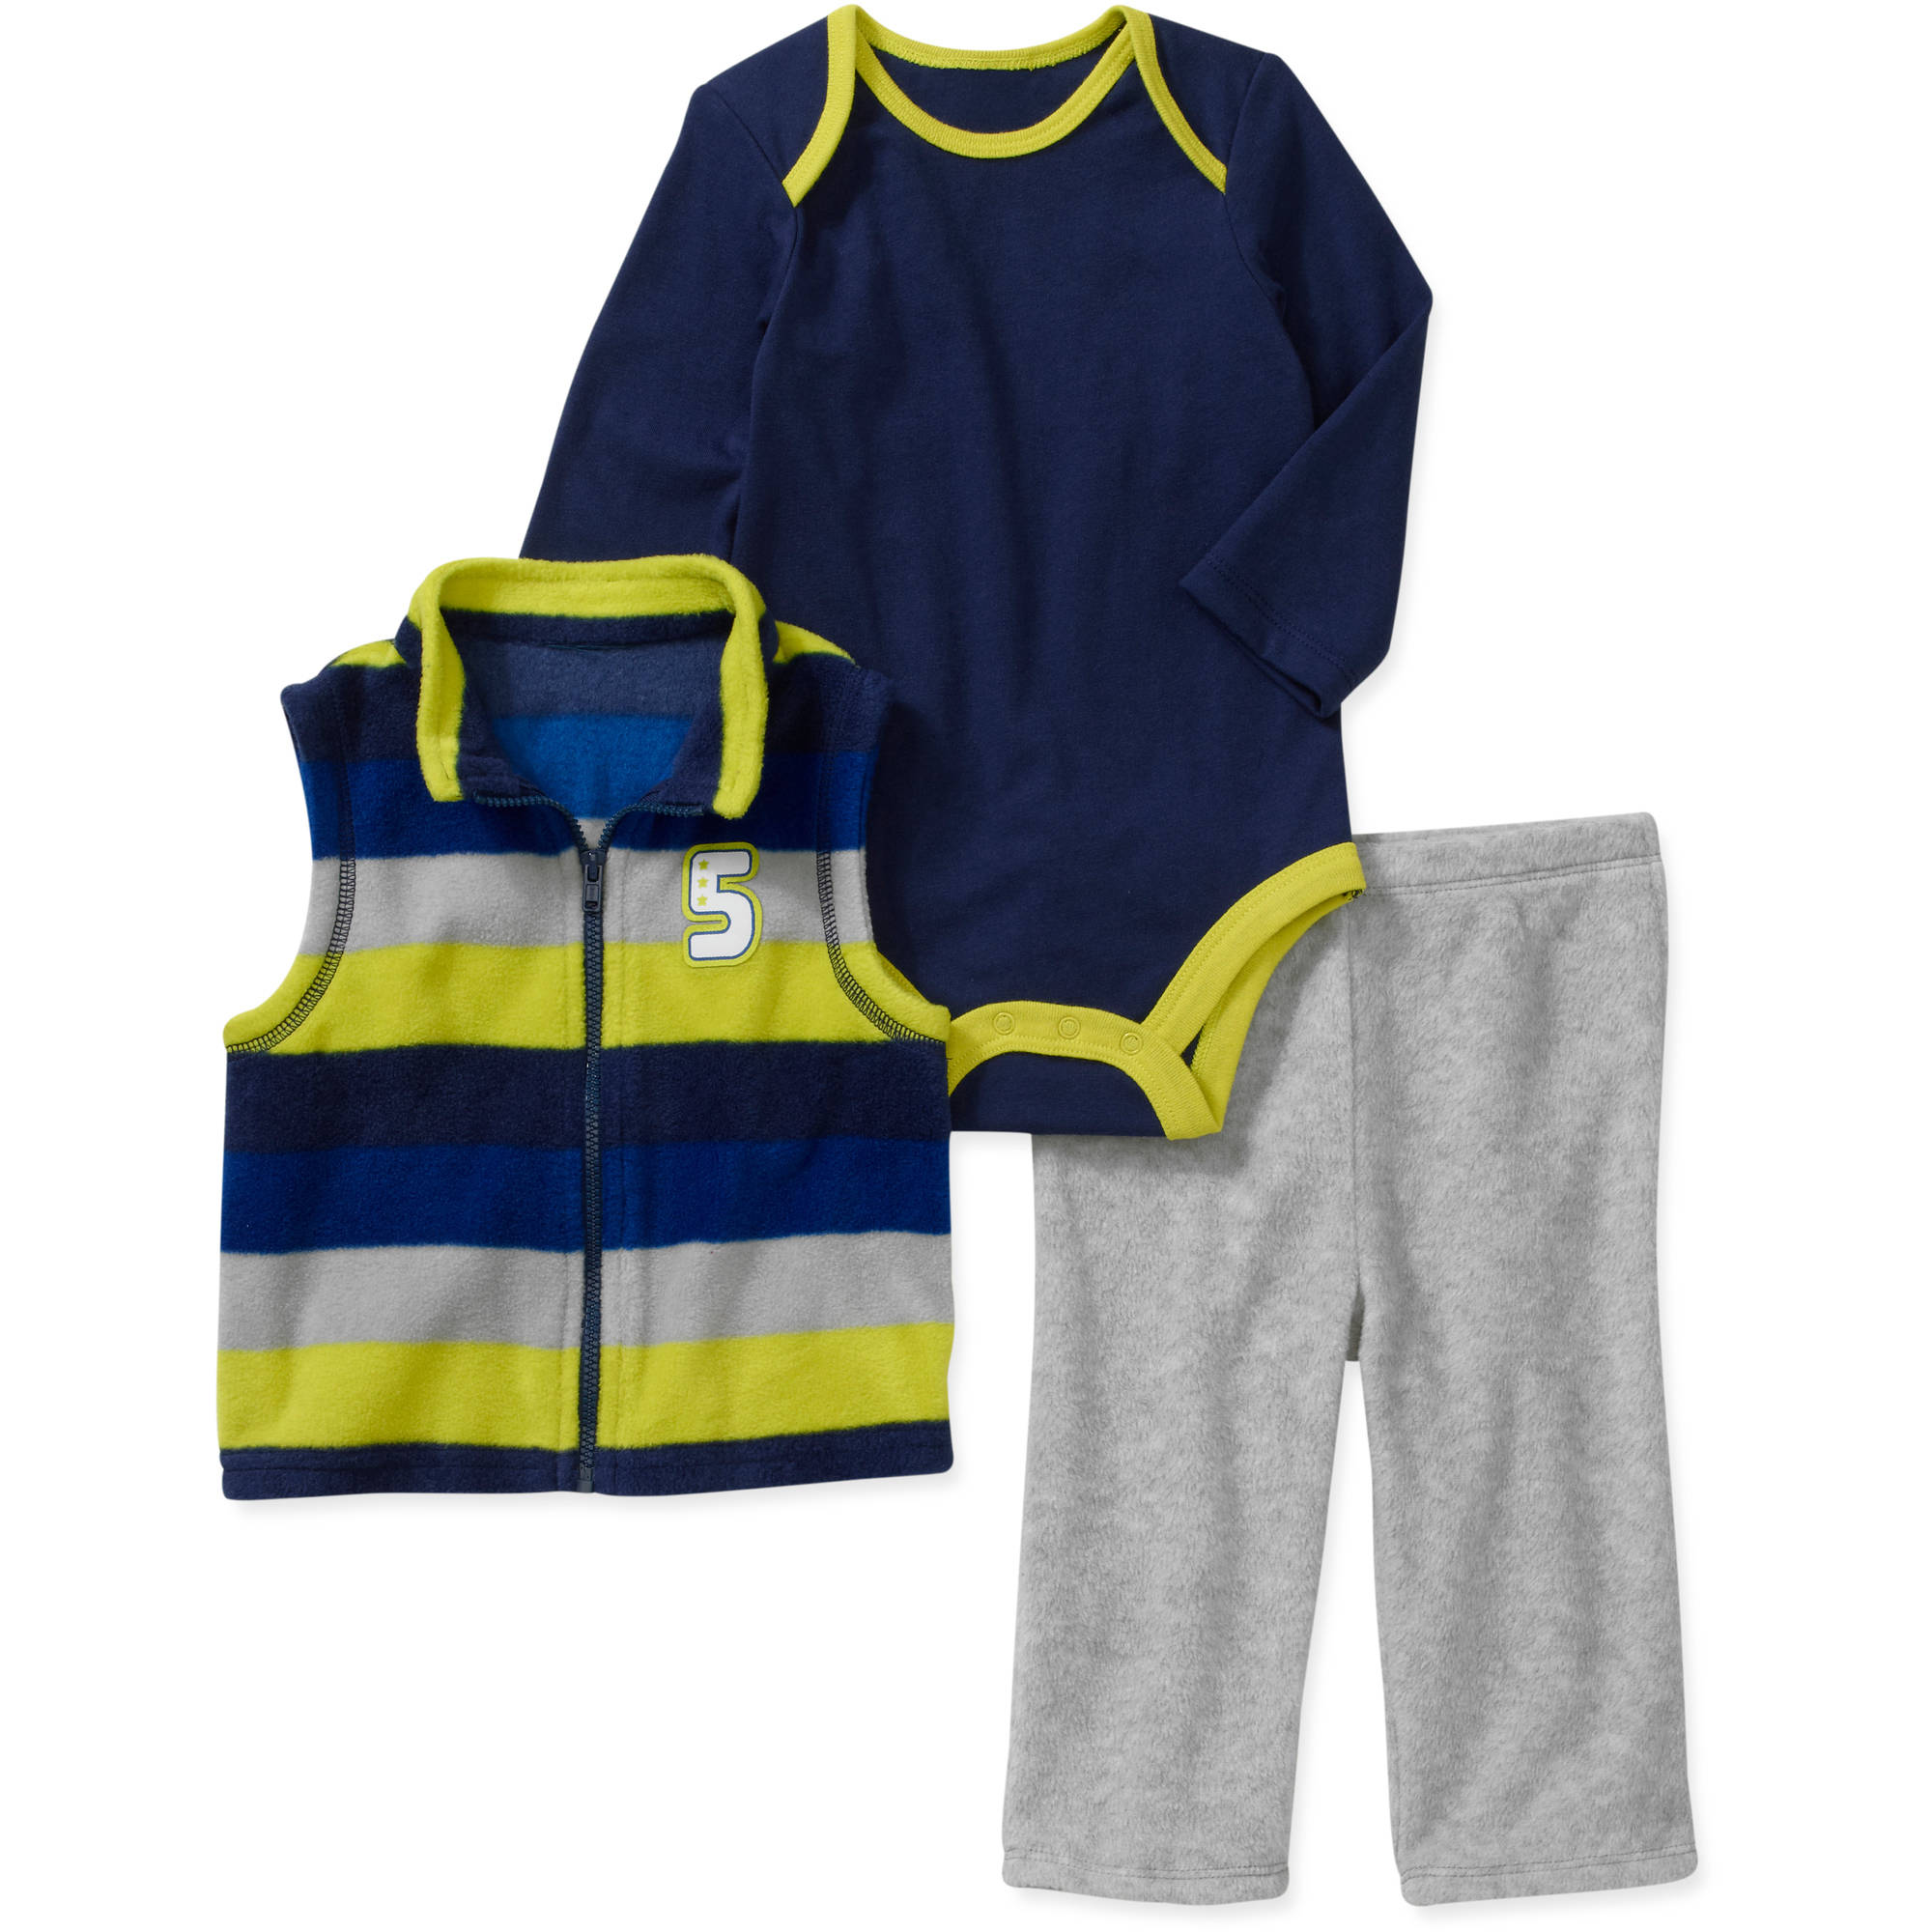 Faded Glory Newborn Boys' 3 Piece Fleece Vest, Creeper and Pant Set